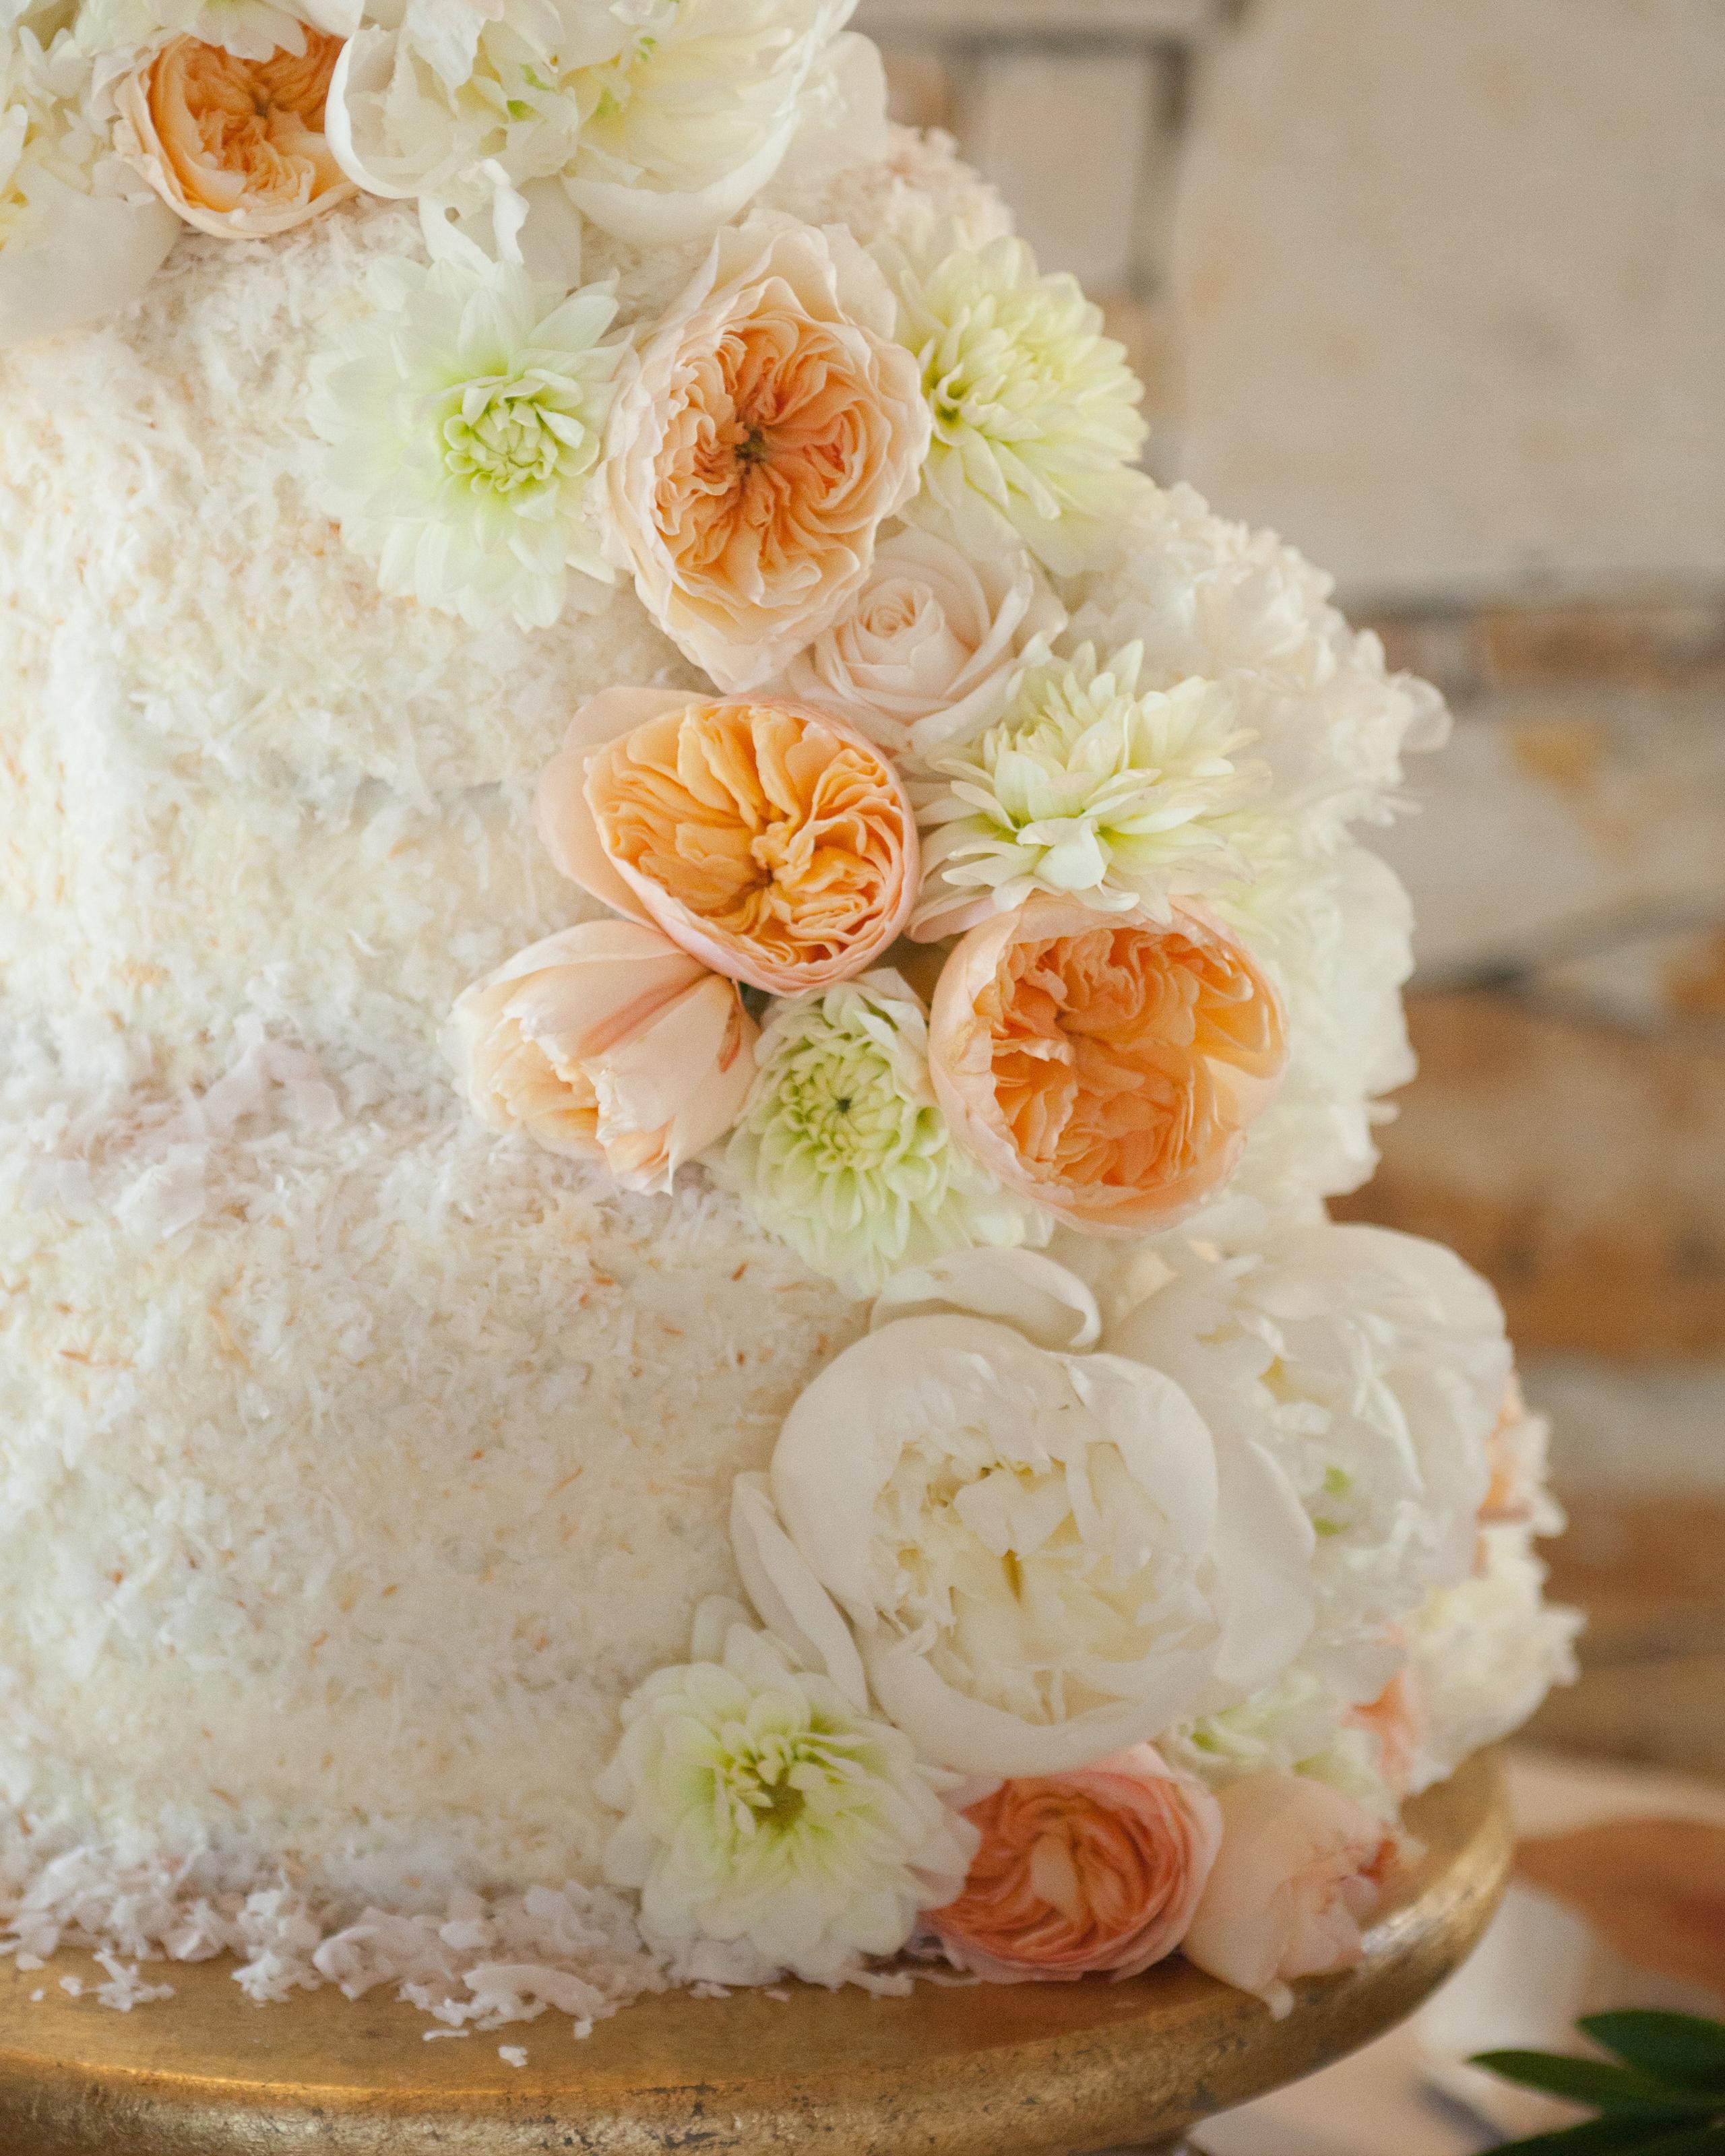 kristin-chris-wedding-cake-403-s112398-0116.jpg